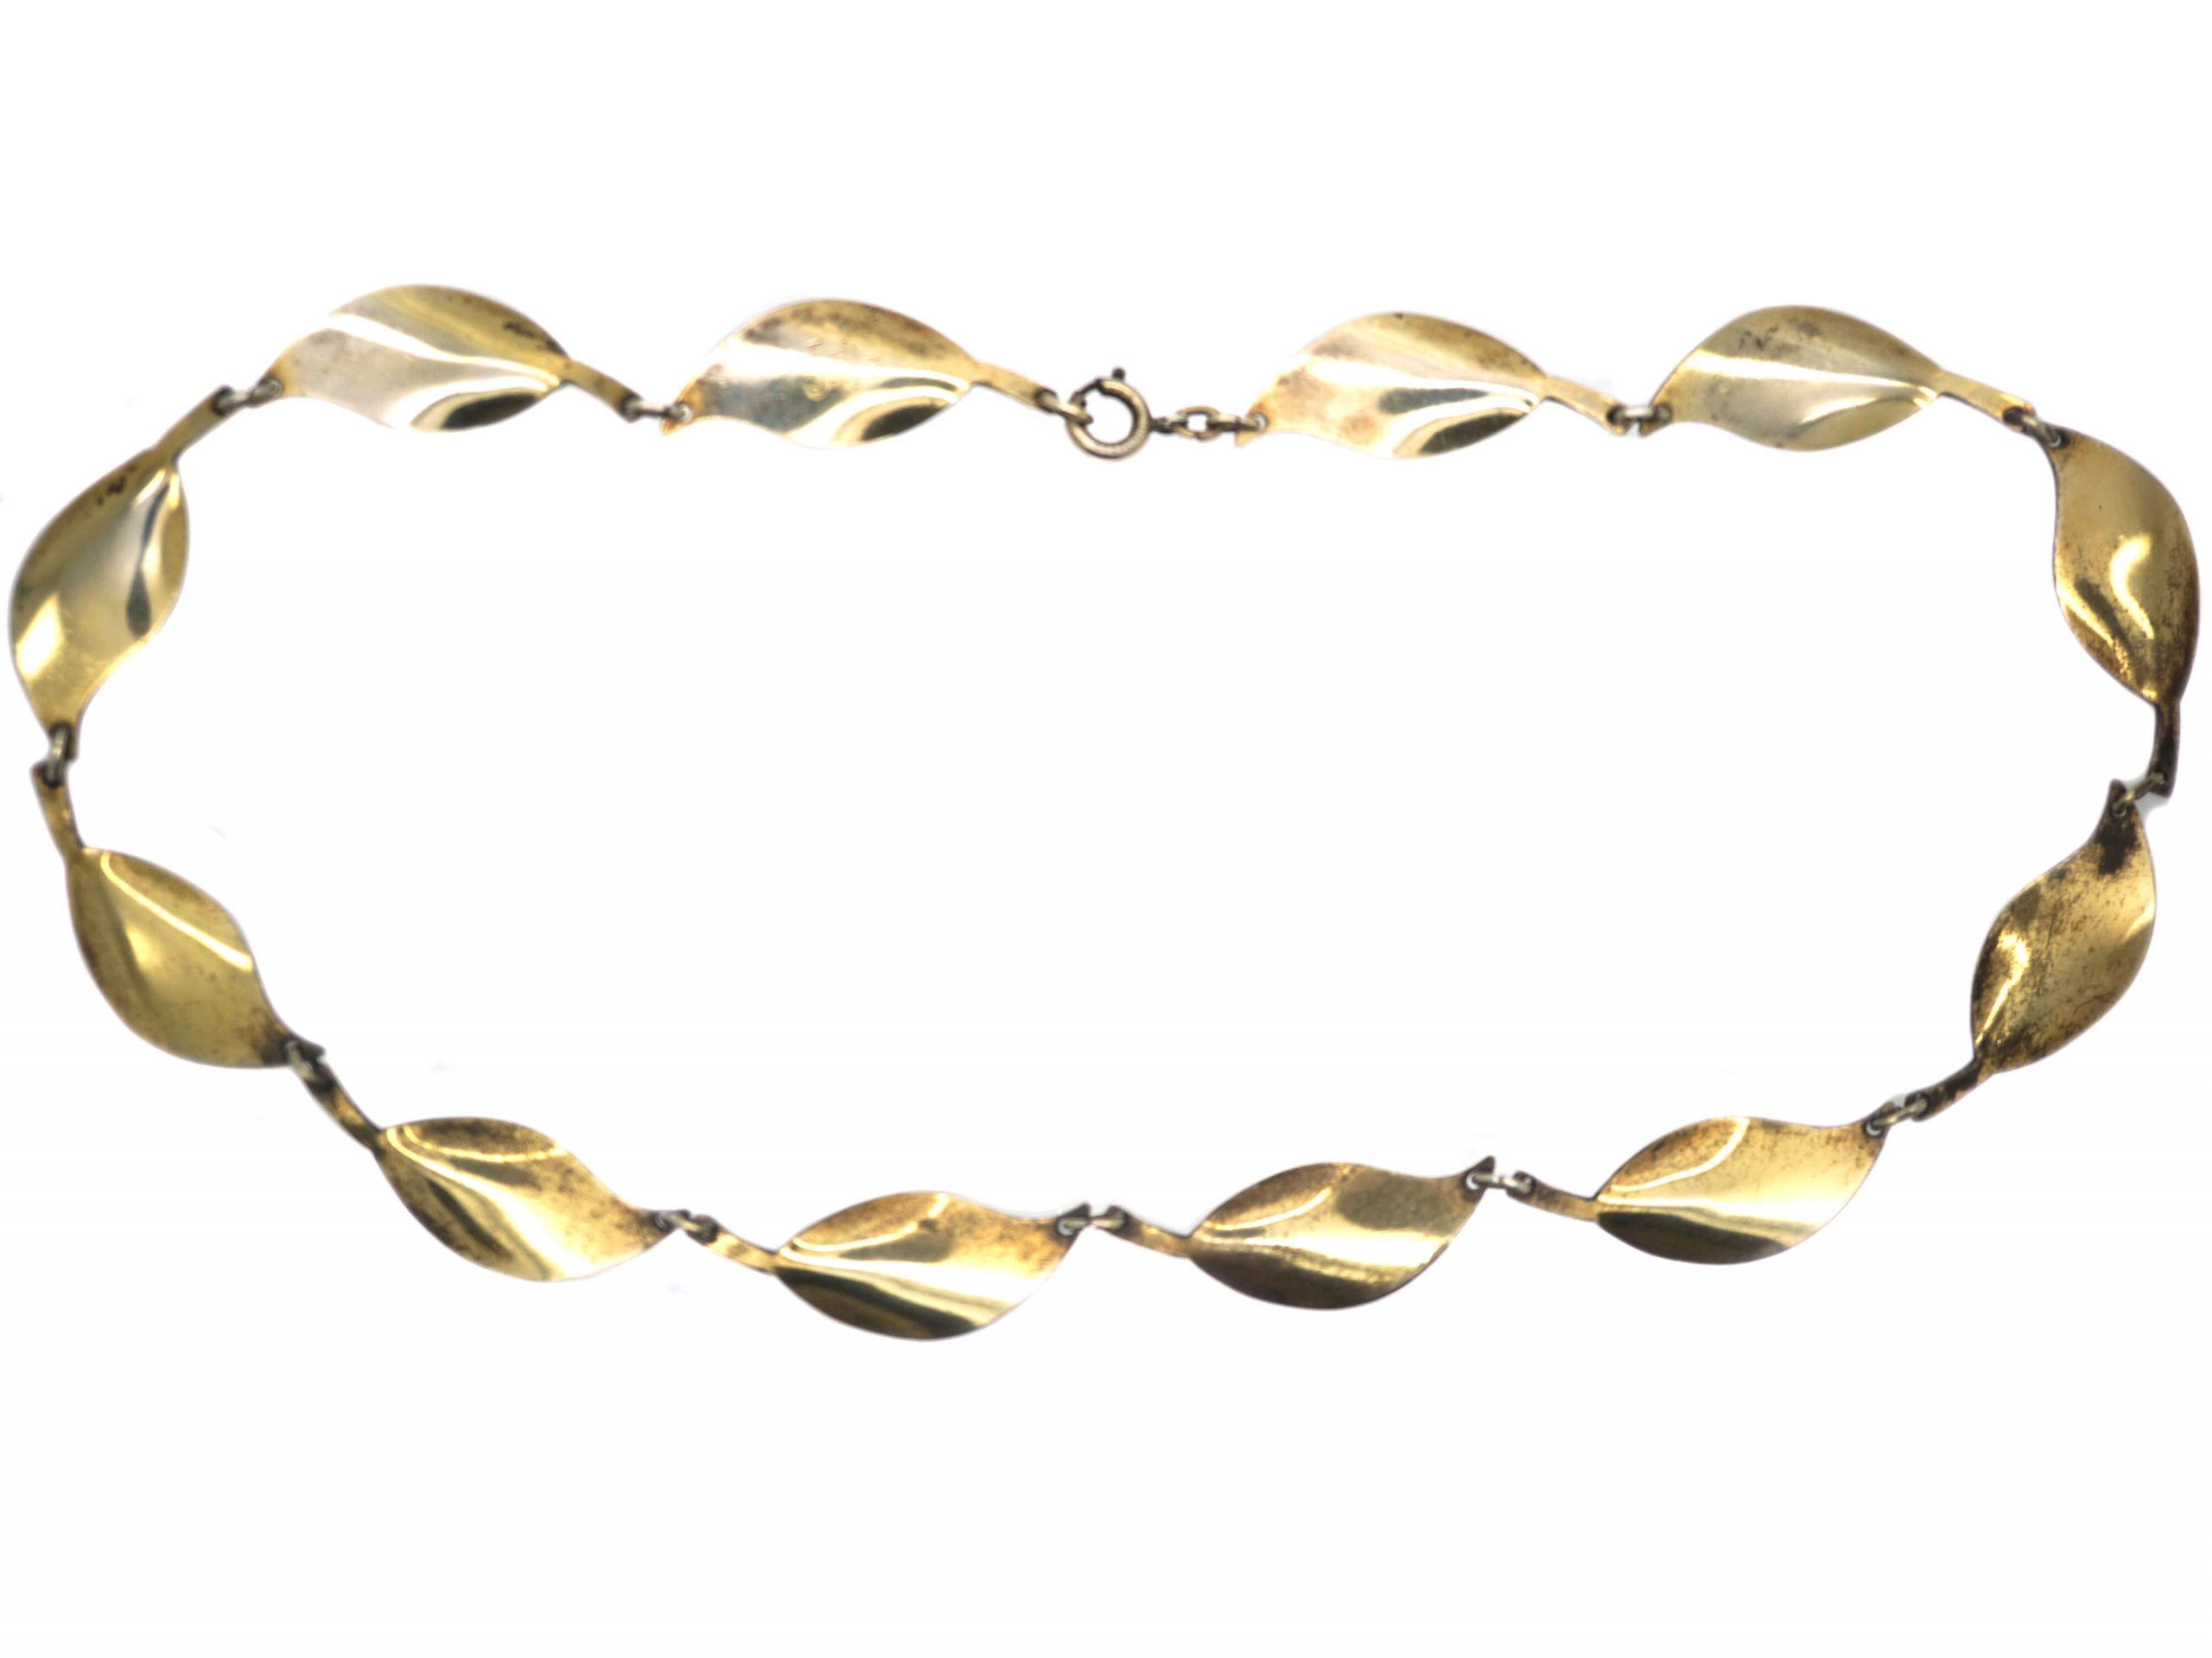 Silver Green Enamel Leaf Design Necklace by David Andersen